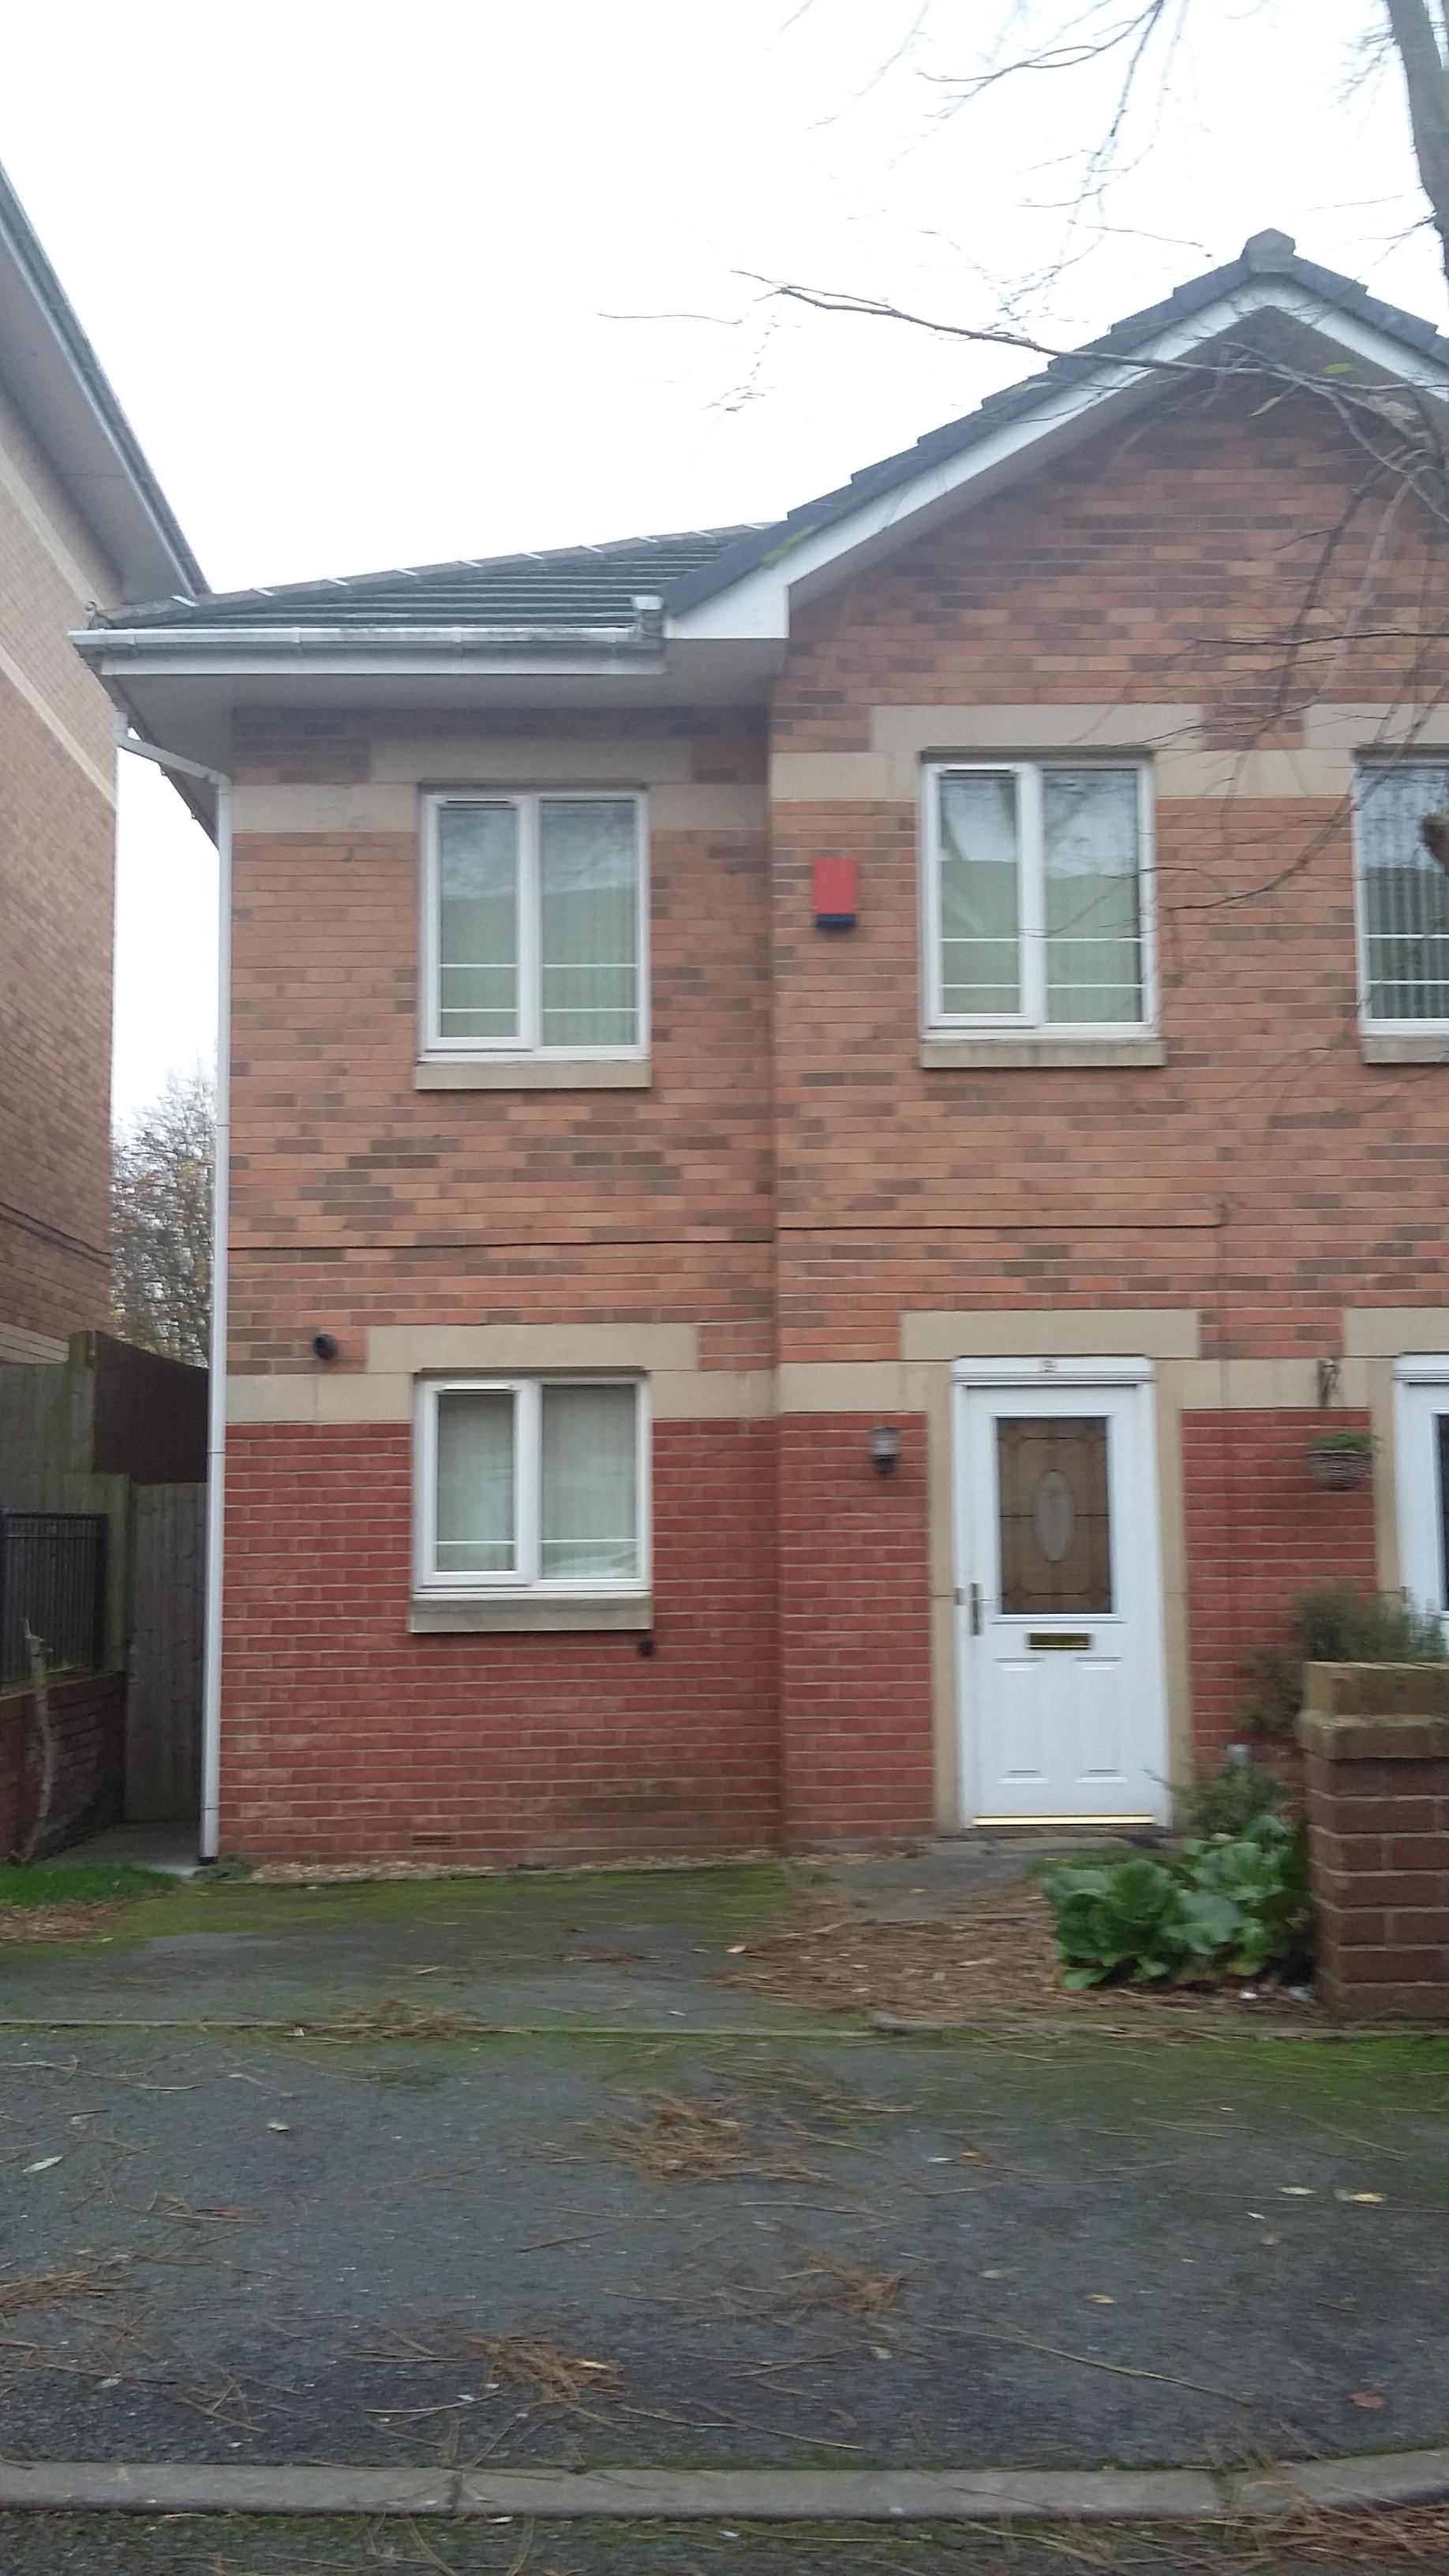 2 Bedroom House To Rent Quayside Hockley B Birmingham B18 5rb